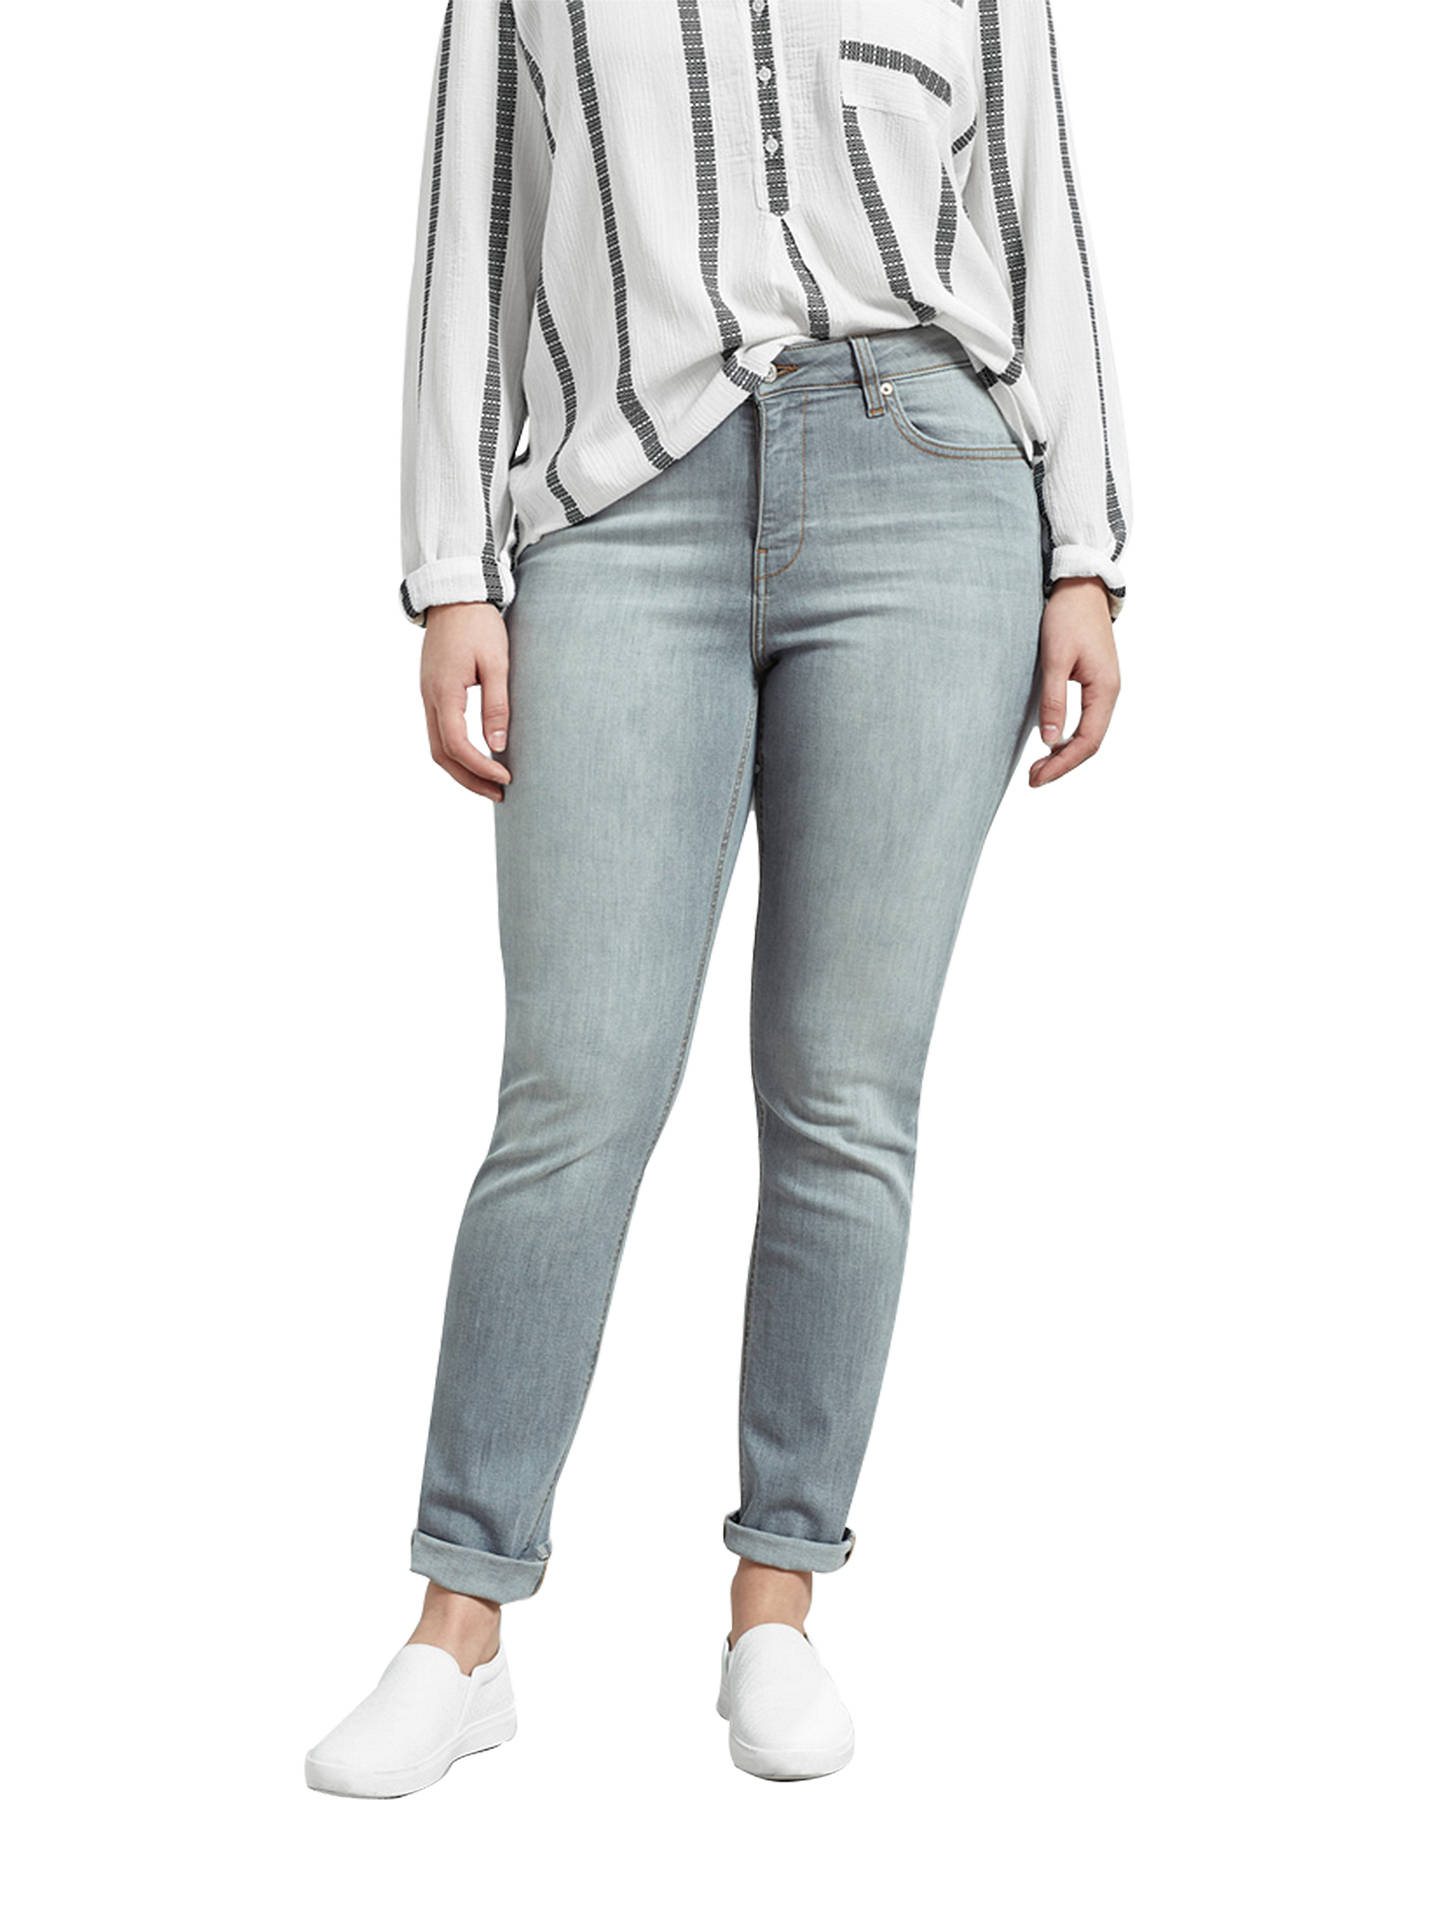 f6d9b90647f Violeta by Mango Straight Theresa Jeans at John Lewis   Partners